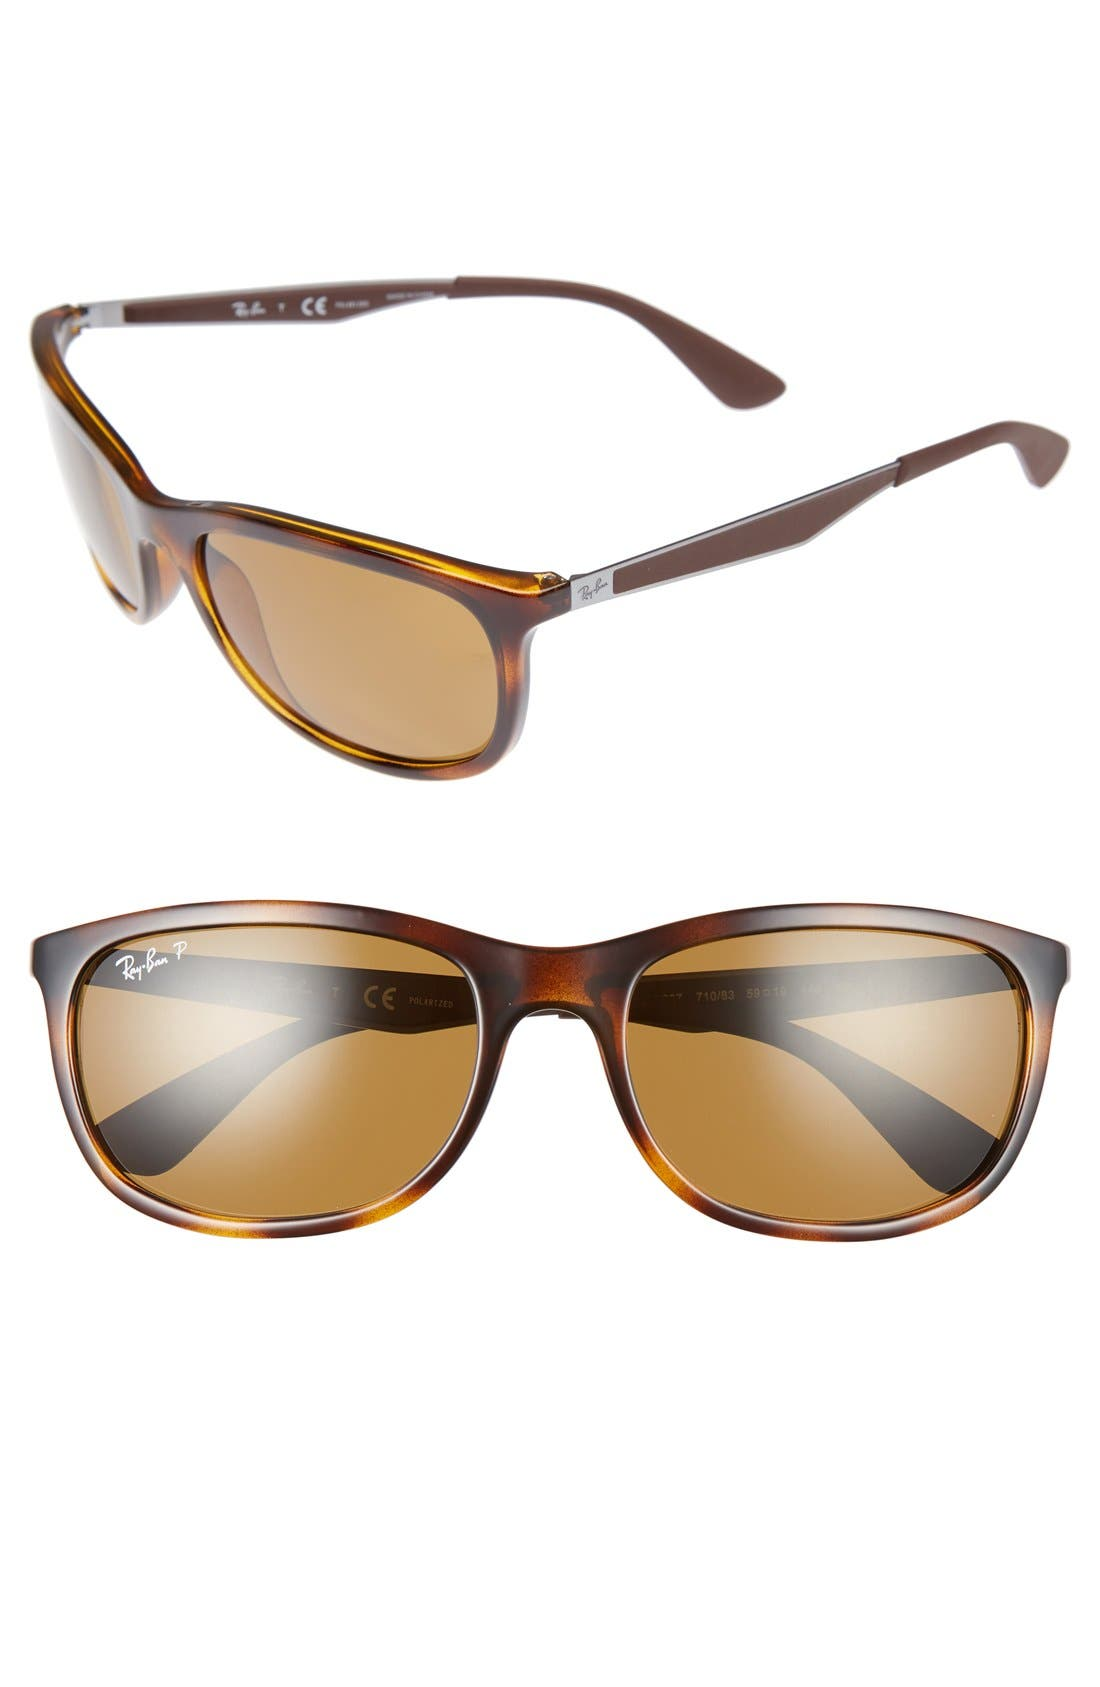 59mm Polarized Sunglasses,                         Main,                         color, Light Havana